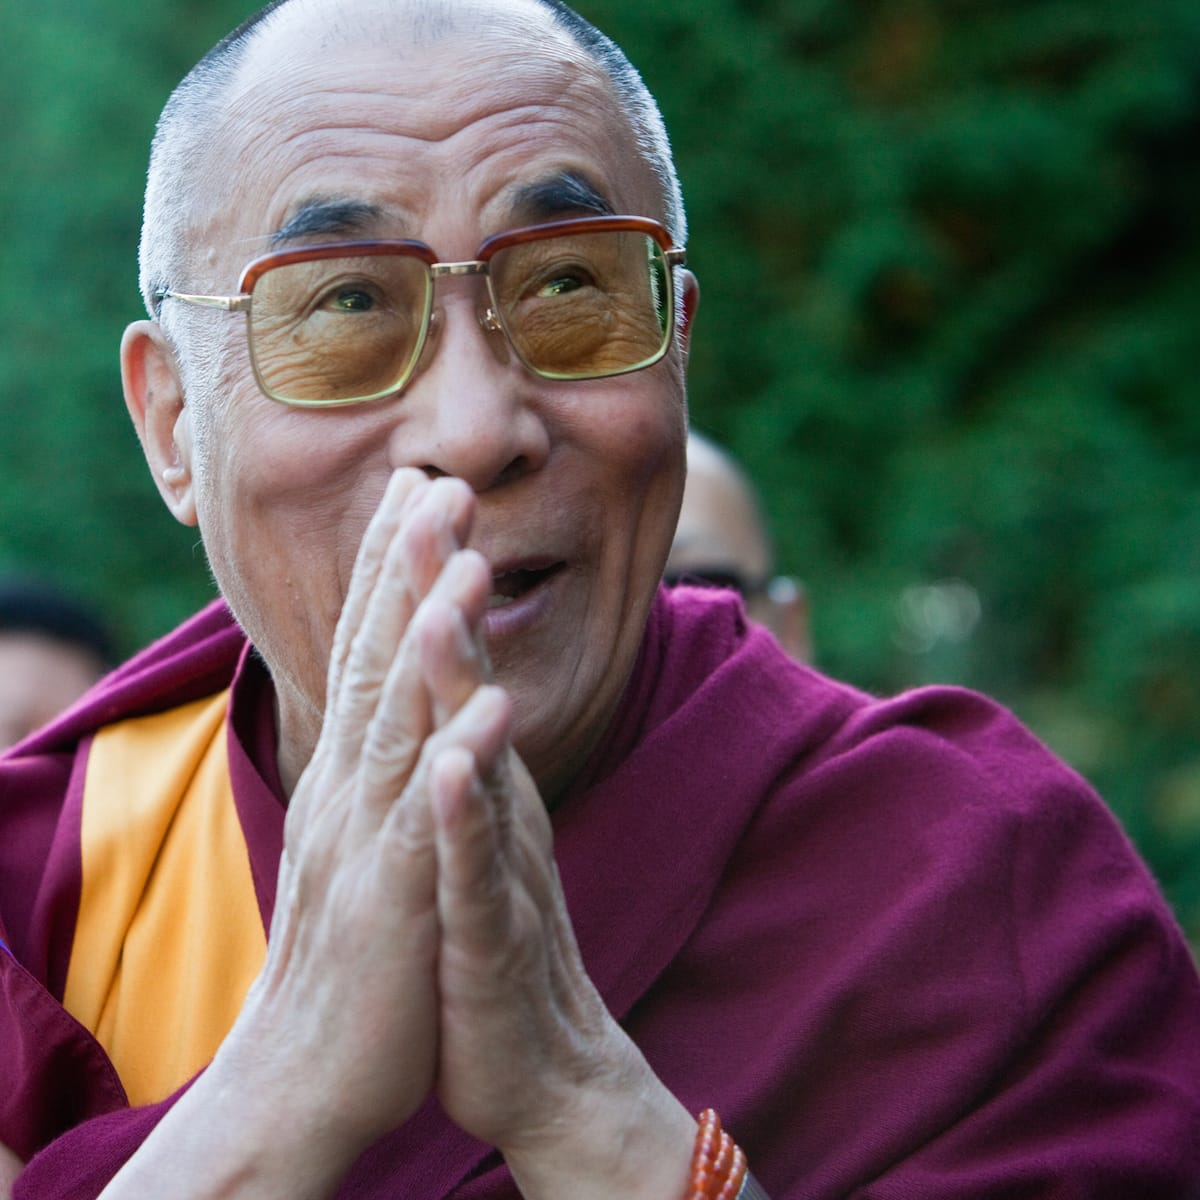 Conversation Dalai Lama Pico Iyer Tibet